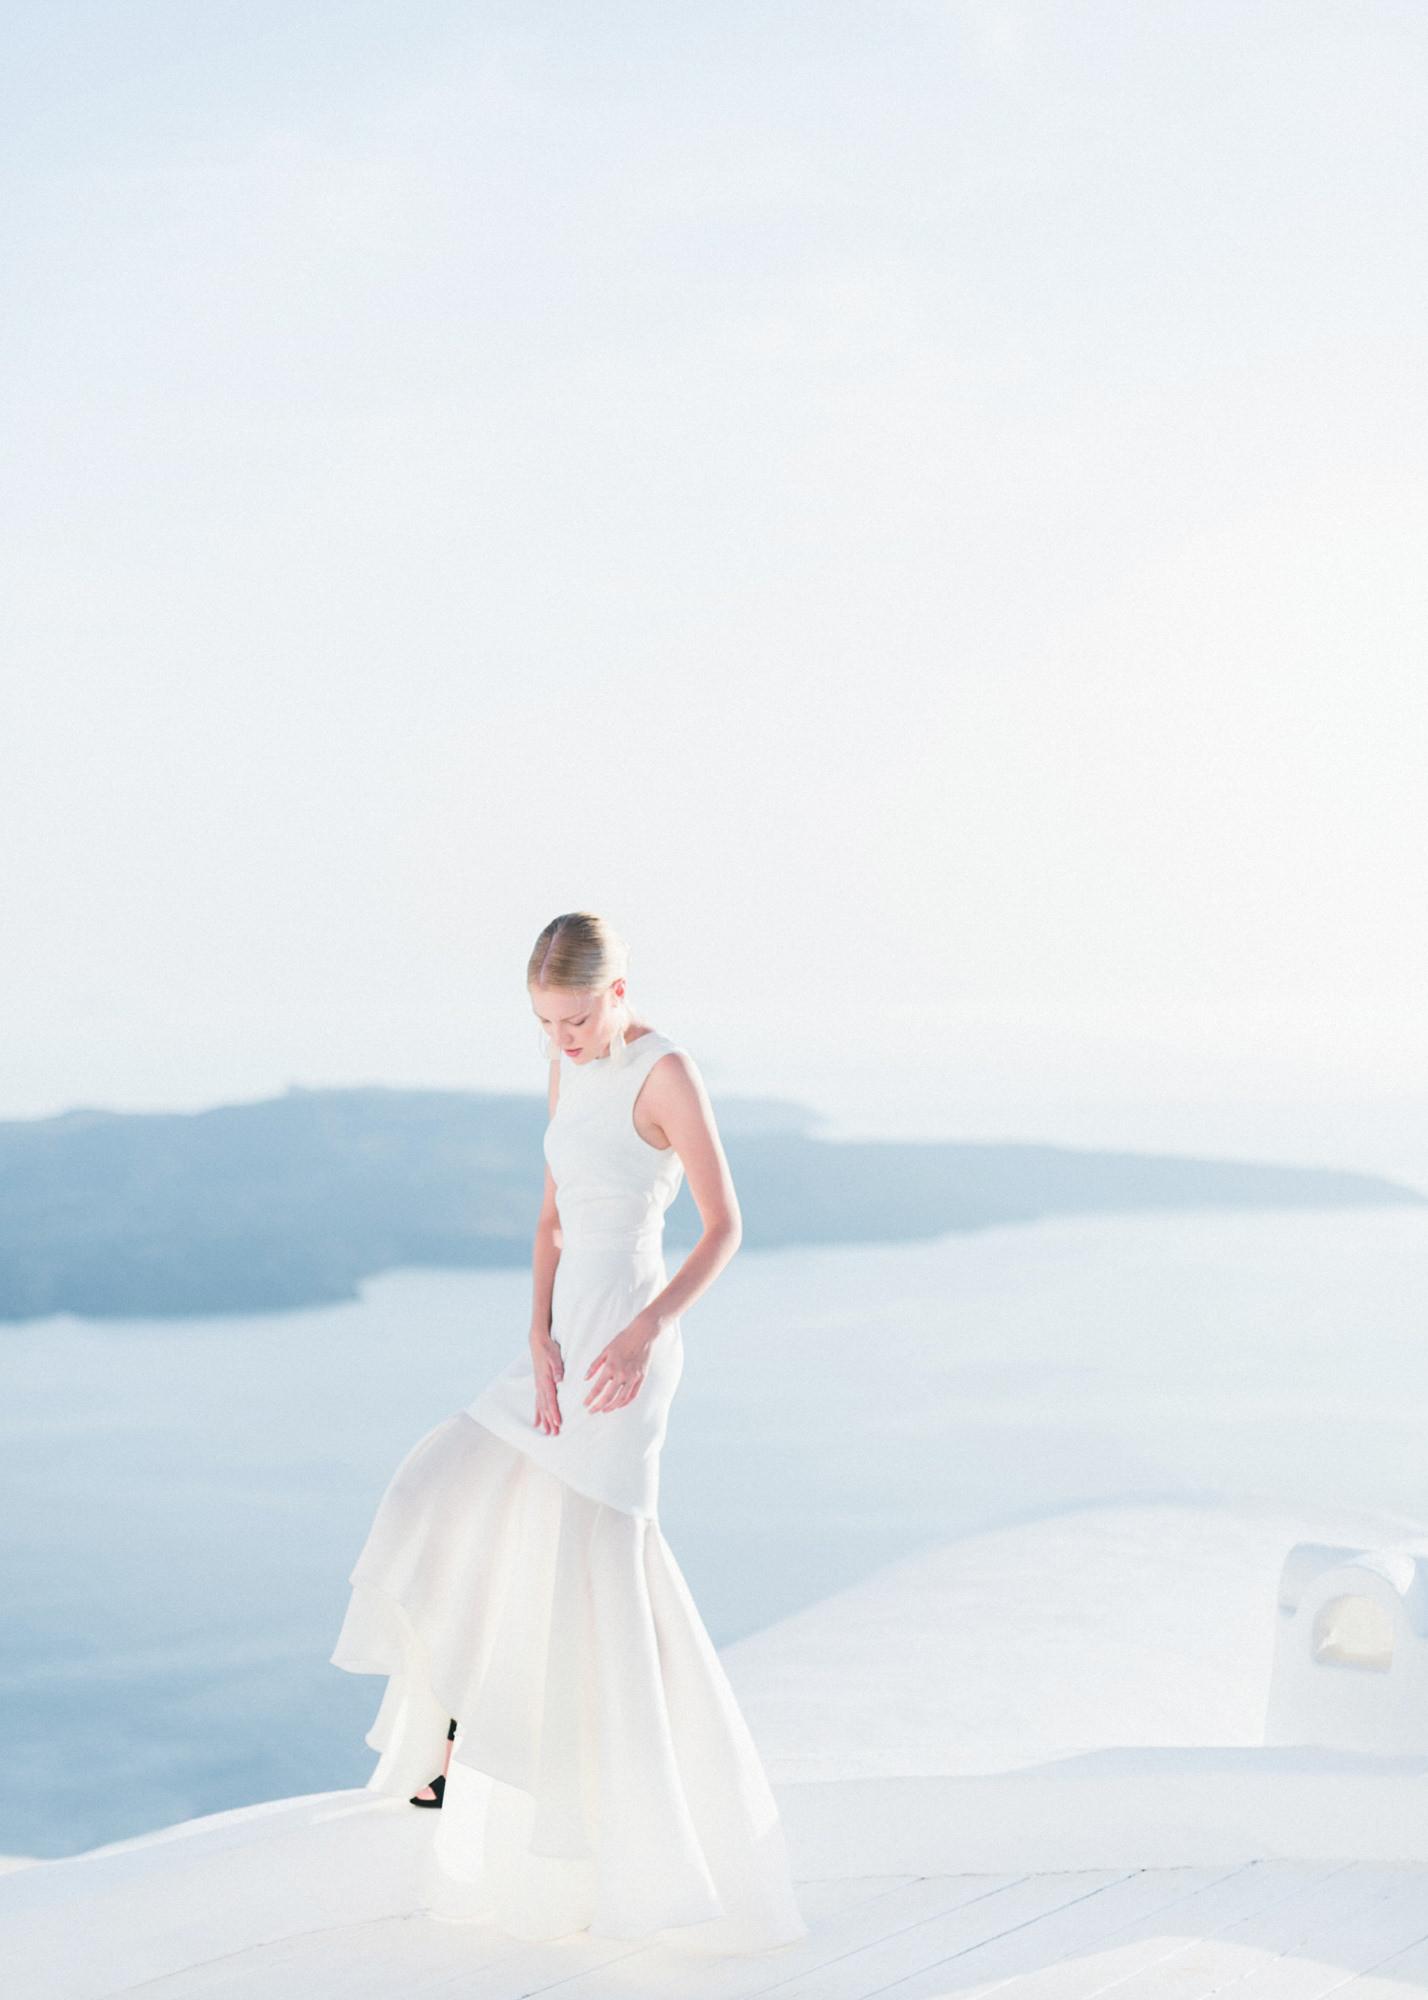 30-portrait-santorini-wedding-photographer-greece-b-v